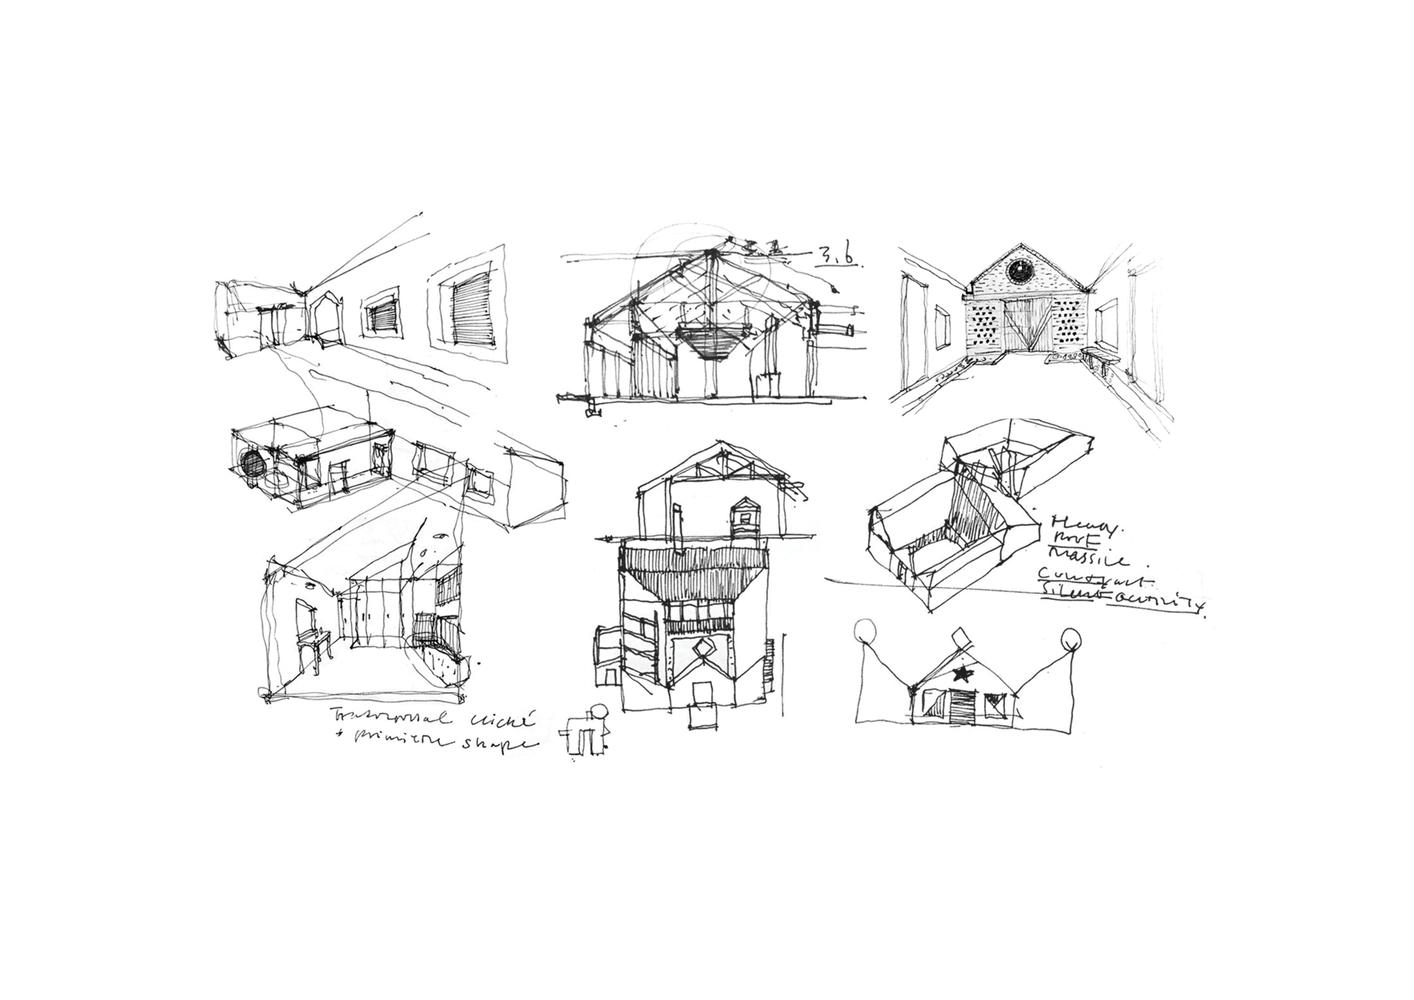 house digeut jip aoa architects [ 1414 x 1000 Pixel ]